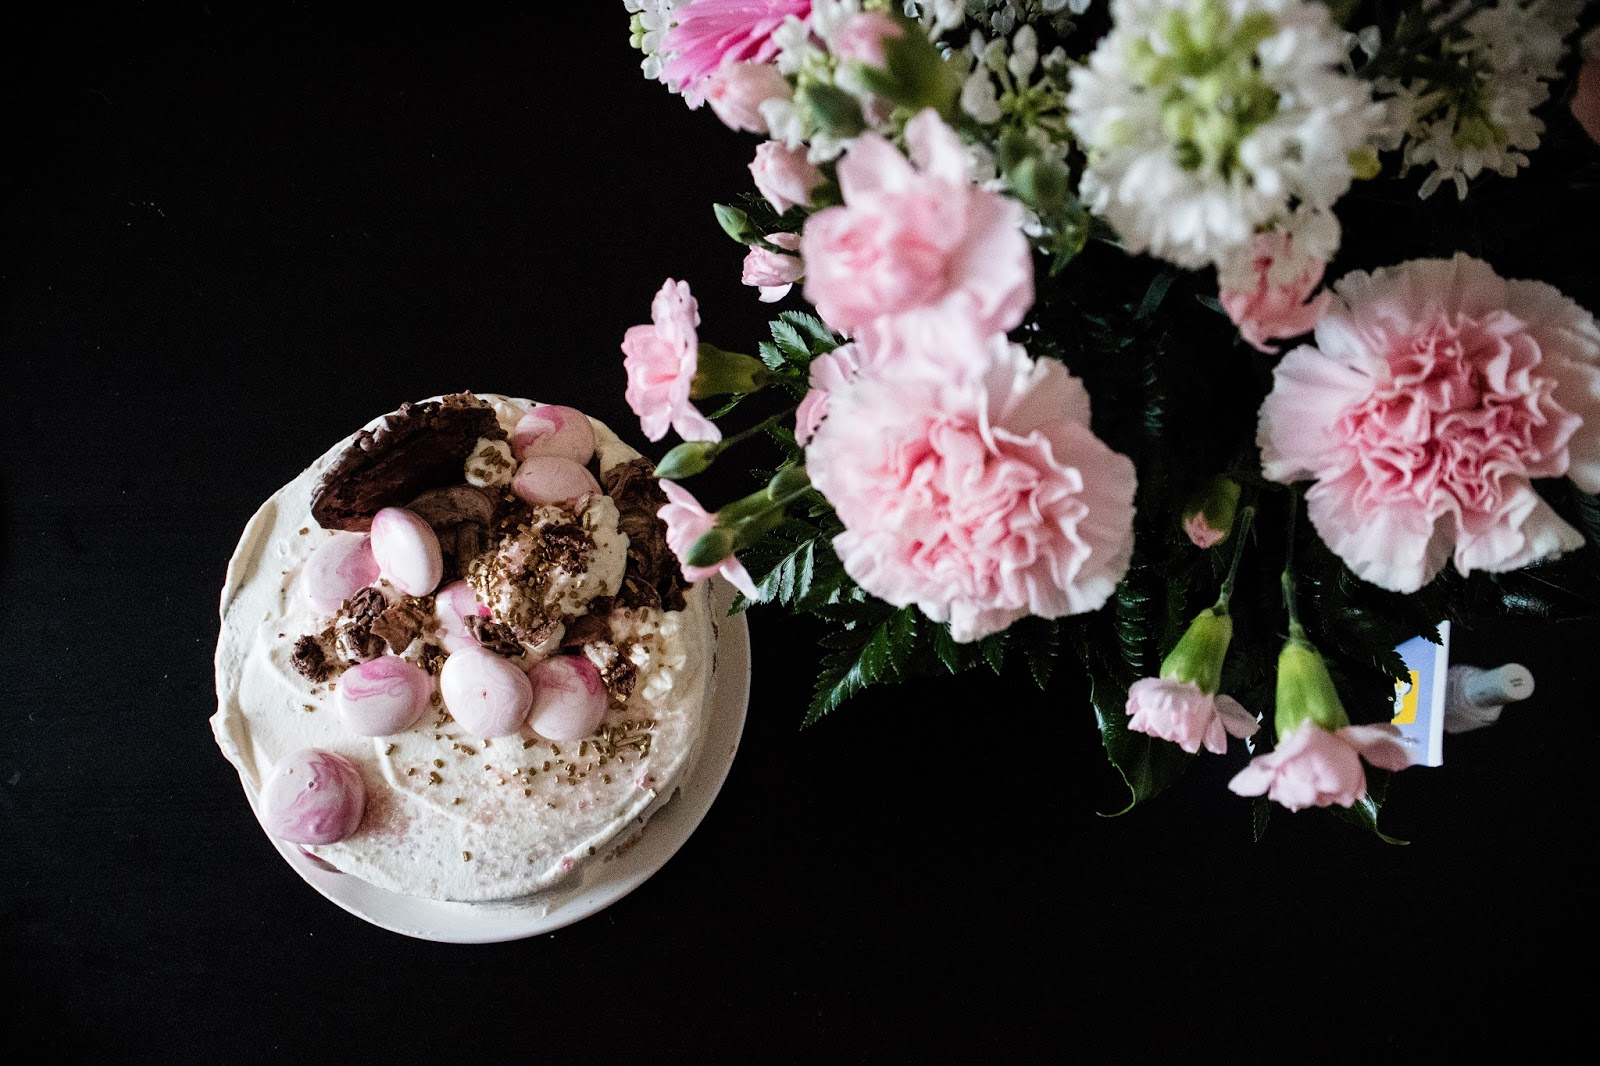 kakku, kakun koristelu, ristiäiset, vauva, vauvavuosi, perhejuhla,